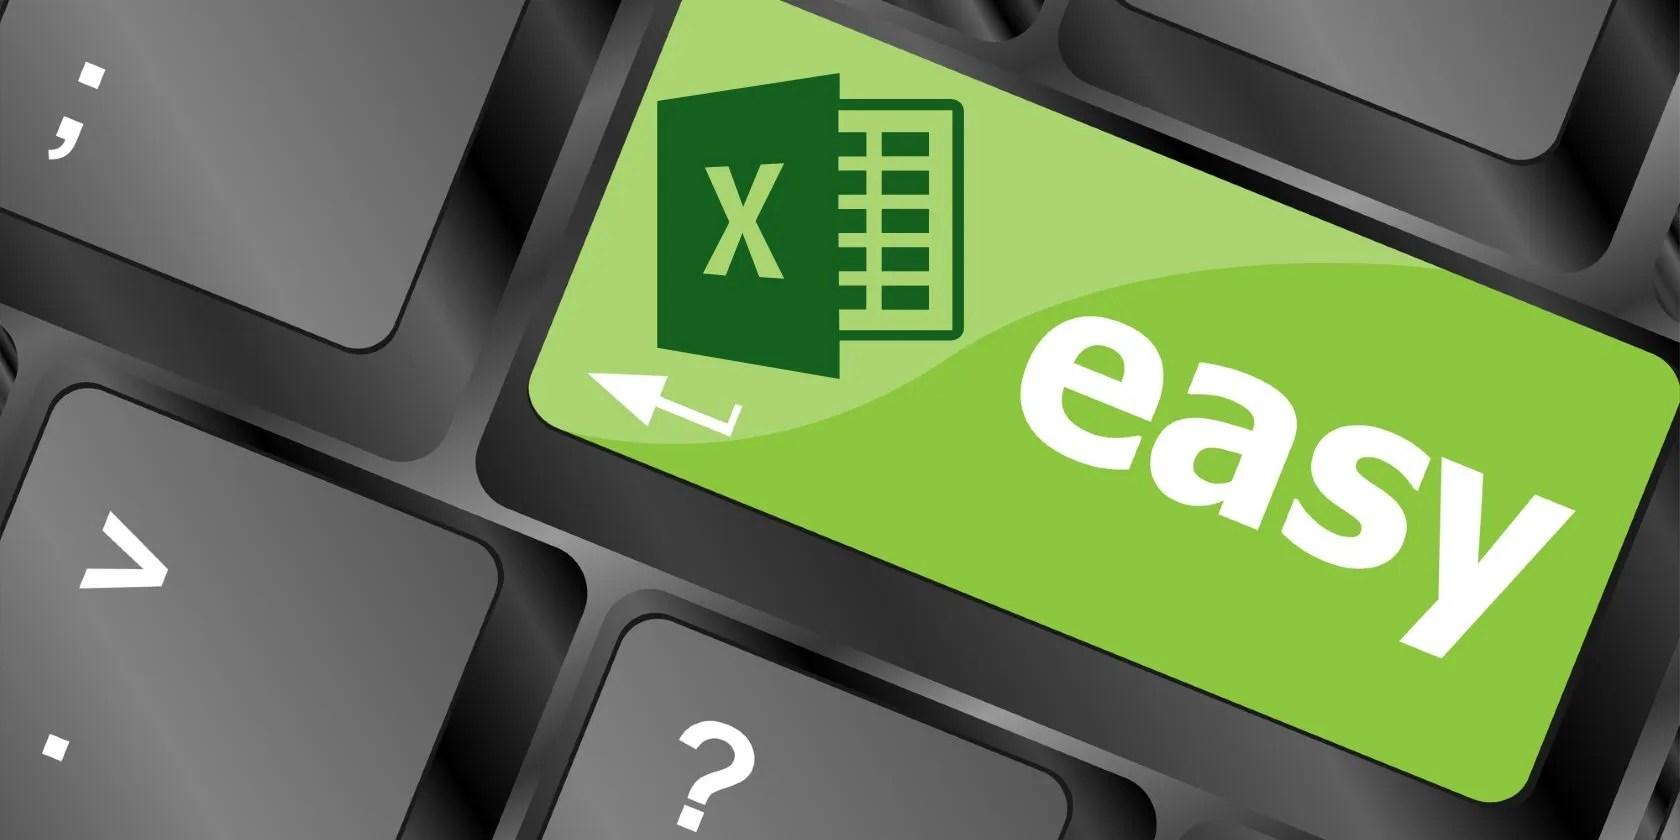 10 Essential Excel Keyboard Shortcuts For Navigating